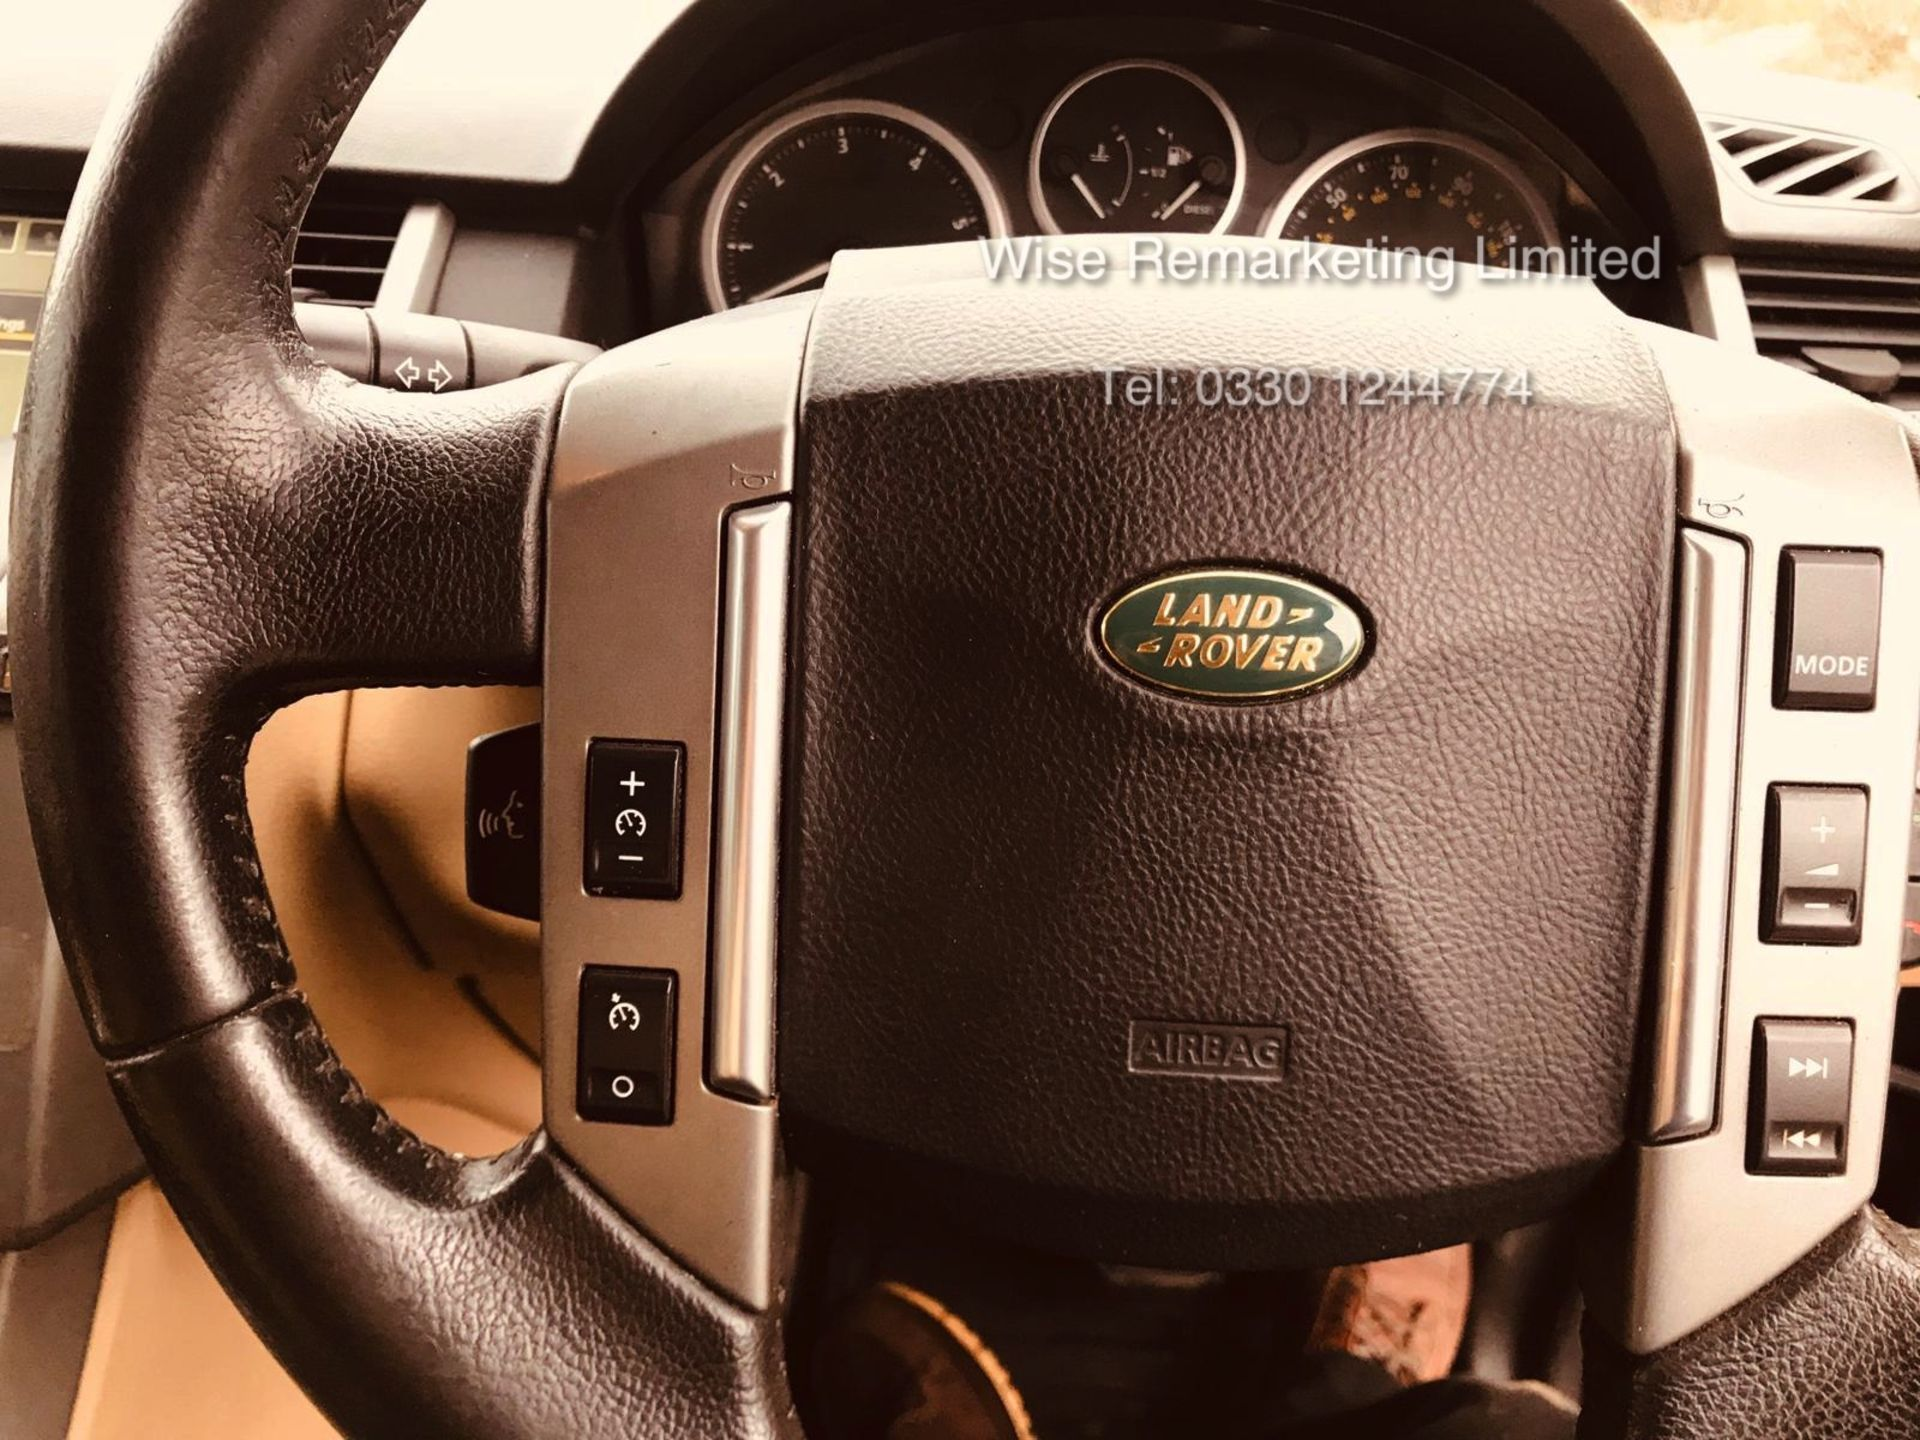 Range Rover Sport 2.7 TDV6 HSE Auto - 2008 Model - Cream Leather - Sat Nav - Heated Seats - Image 12 of 19